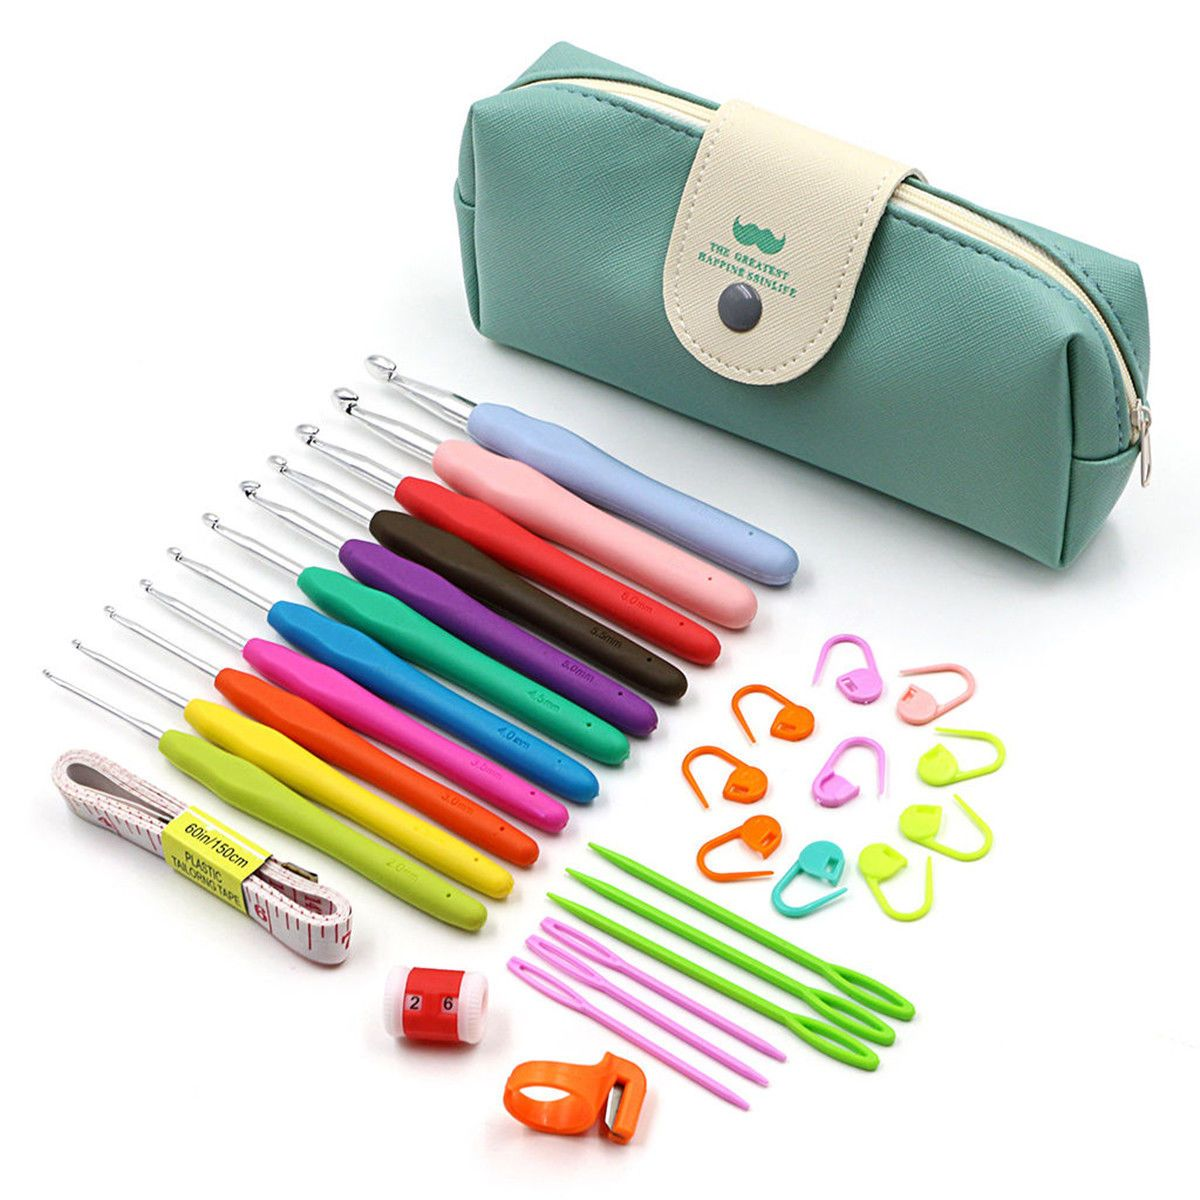 45Pcs//set Ergonomic Crochet Hooks Set with Rubbery Handles Knitting Needles Kits